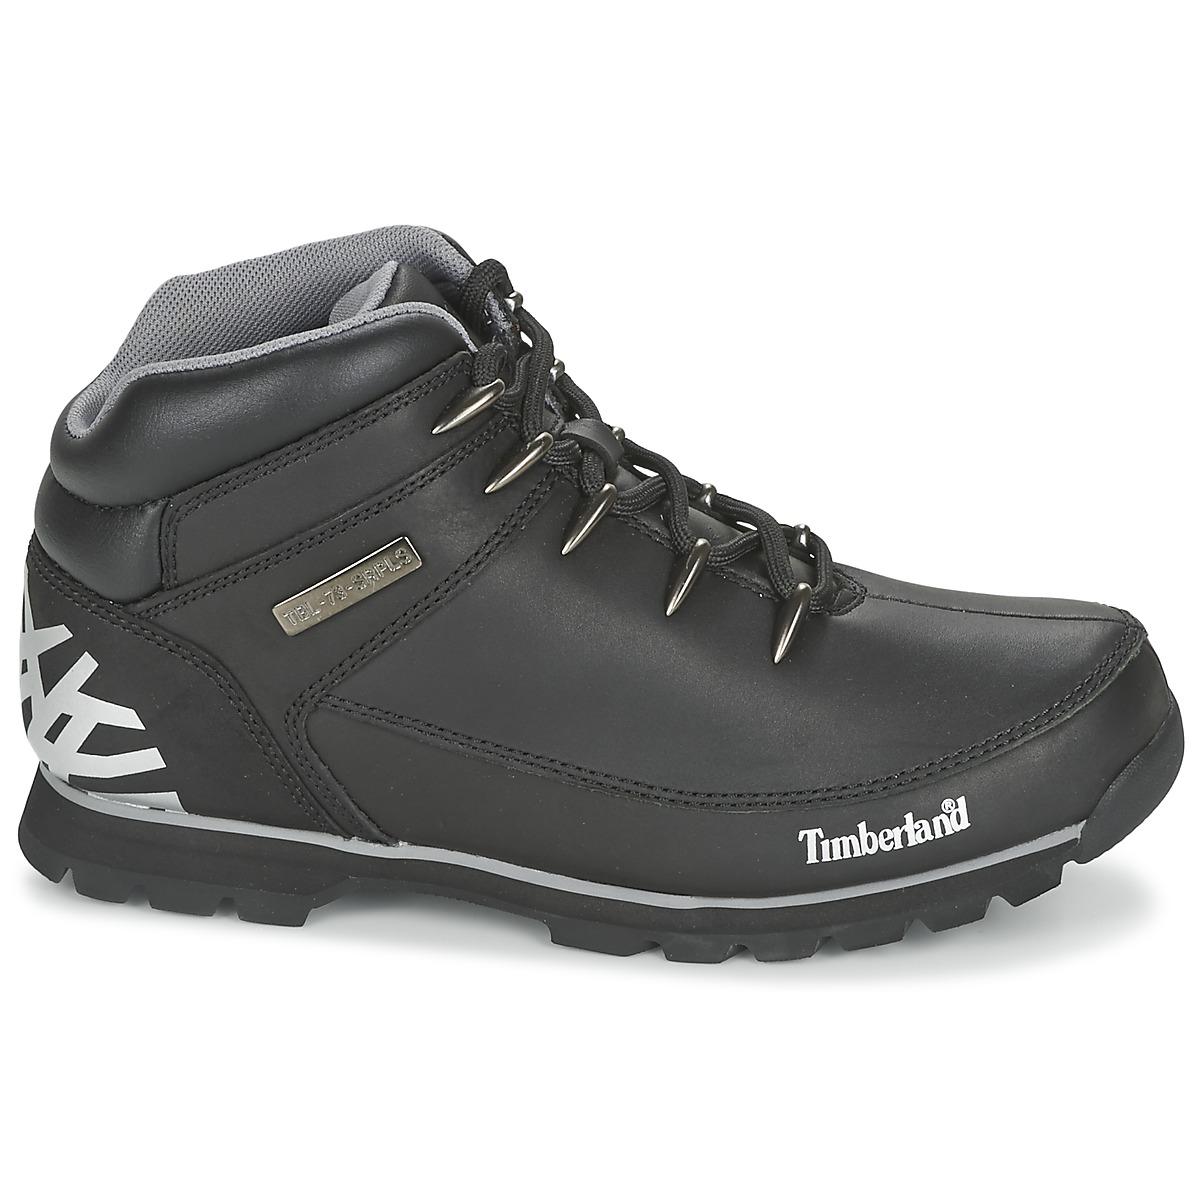 491b29fe71c 80%OFF Timberland EURO SPRINT HIKER Black Shoes Mid boots Men ...